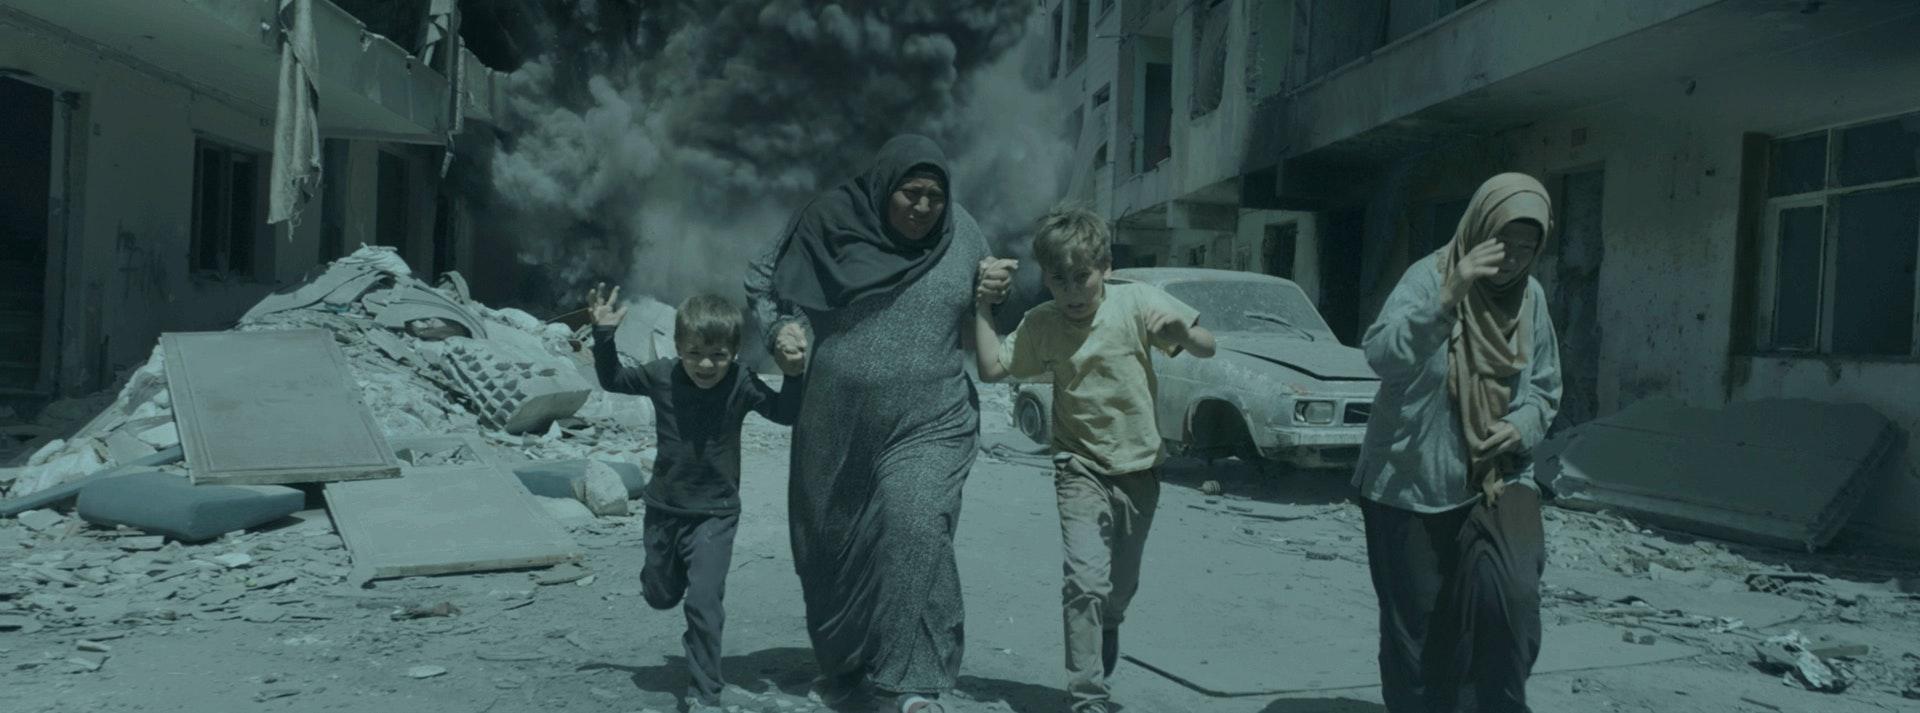 Aleppo bombing sequence